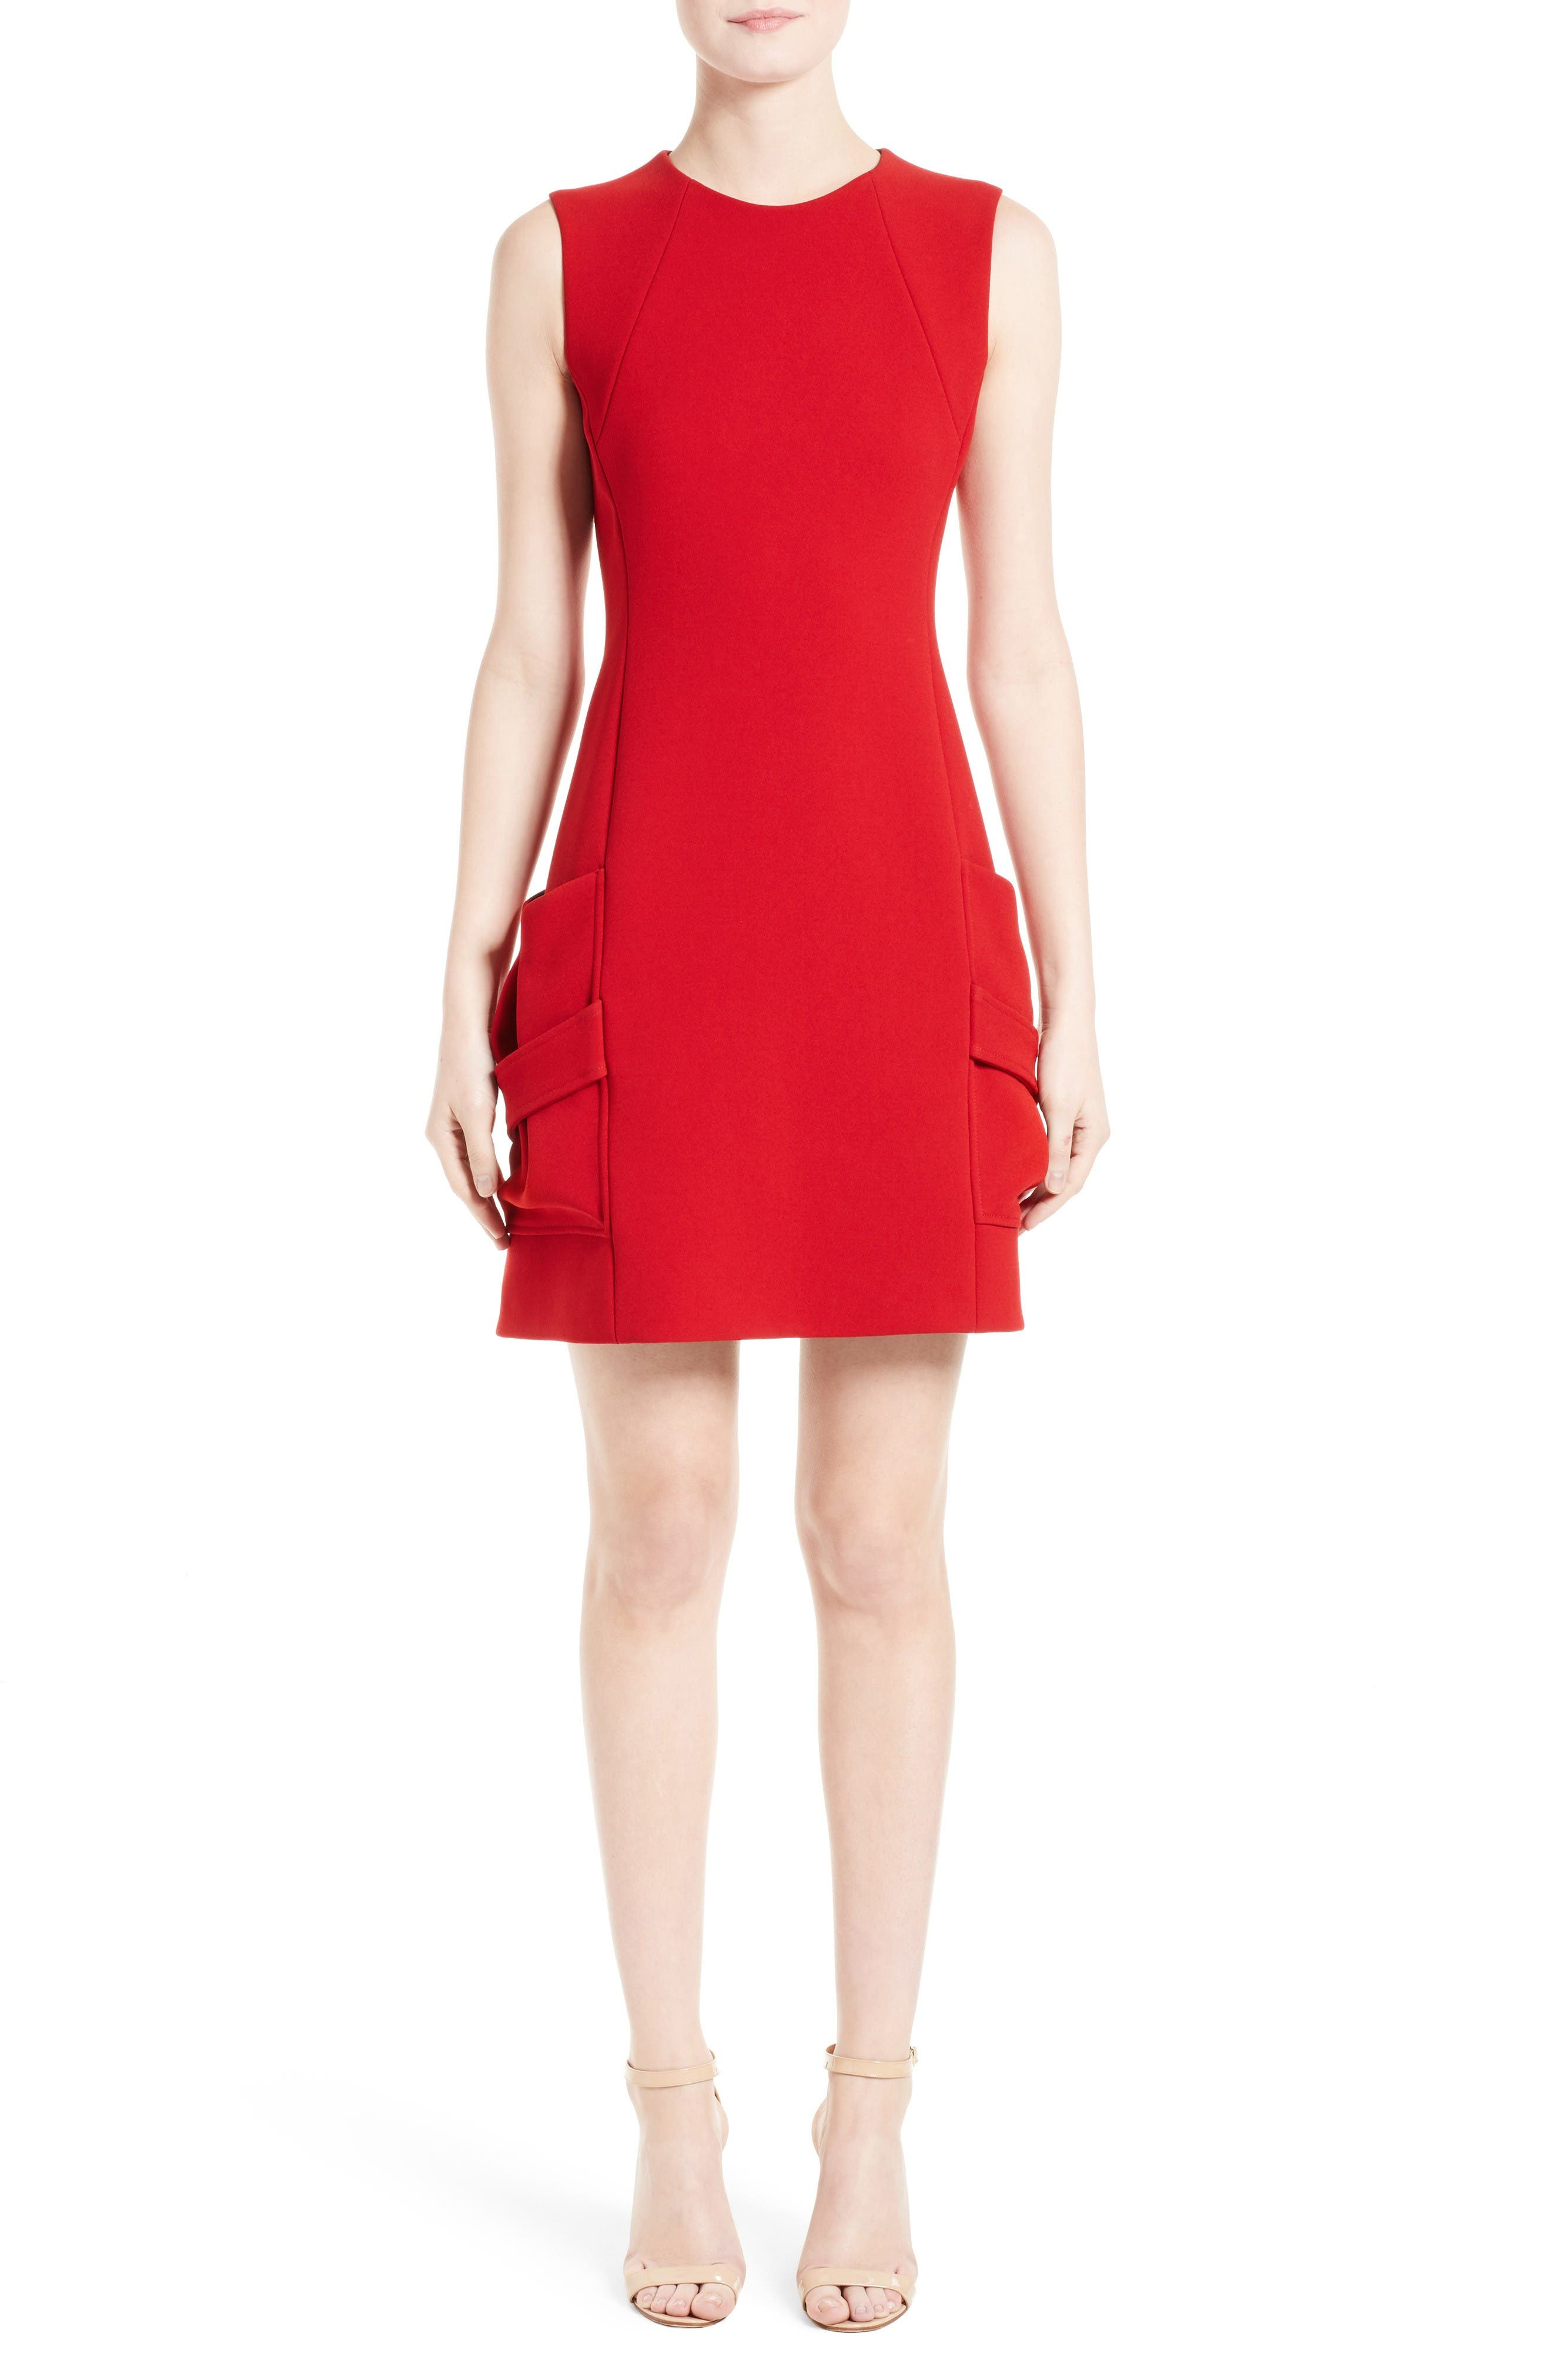 Alternate Image 1 Selected - Victoria Beckham Crepe Minidress